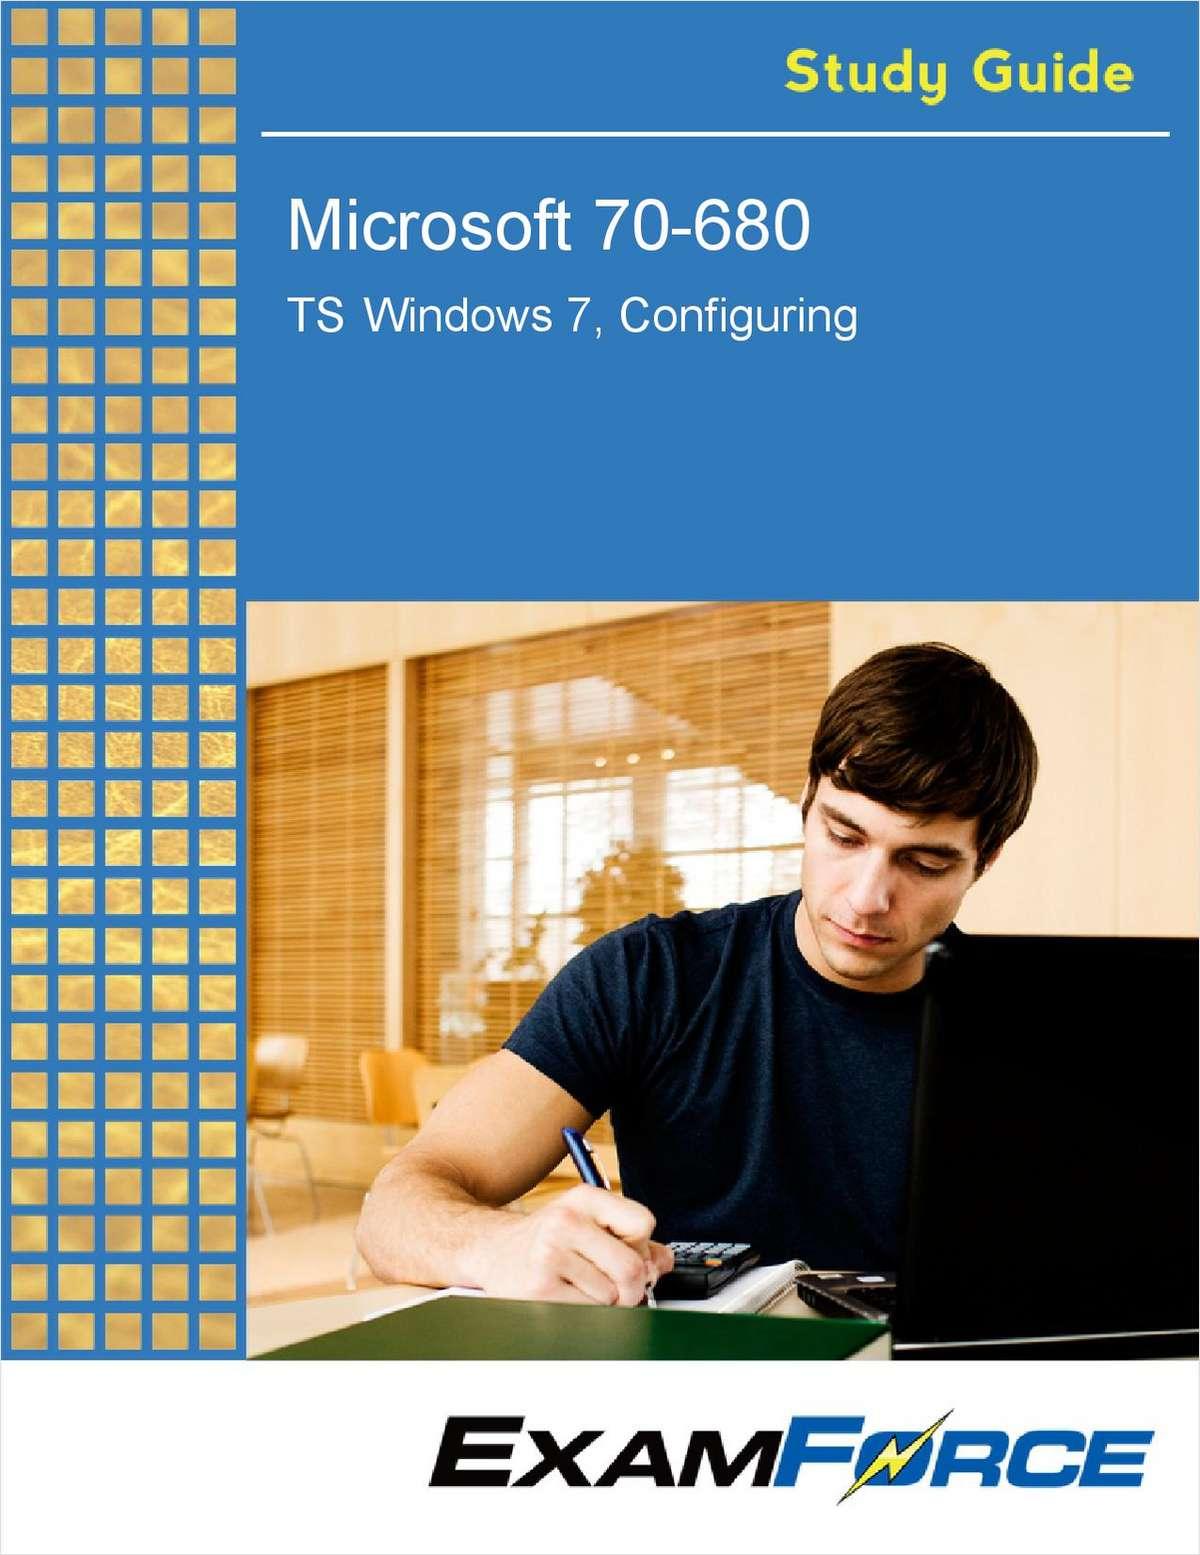 Microsoft 70-680 TS: Windows 7, Configuring (FREE Study Guide)